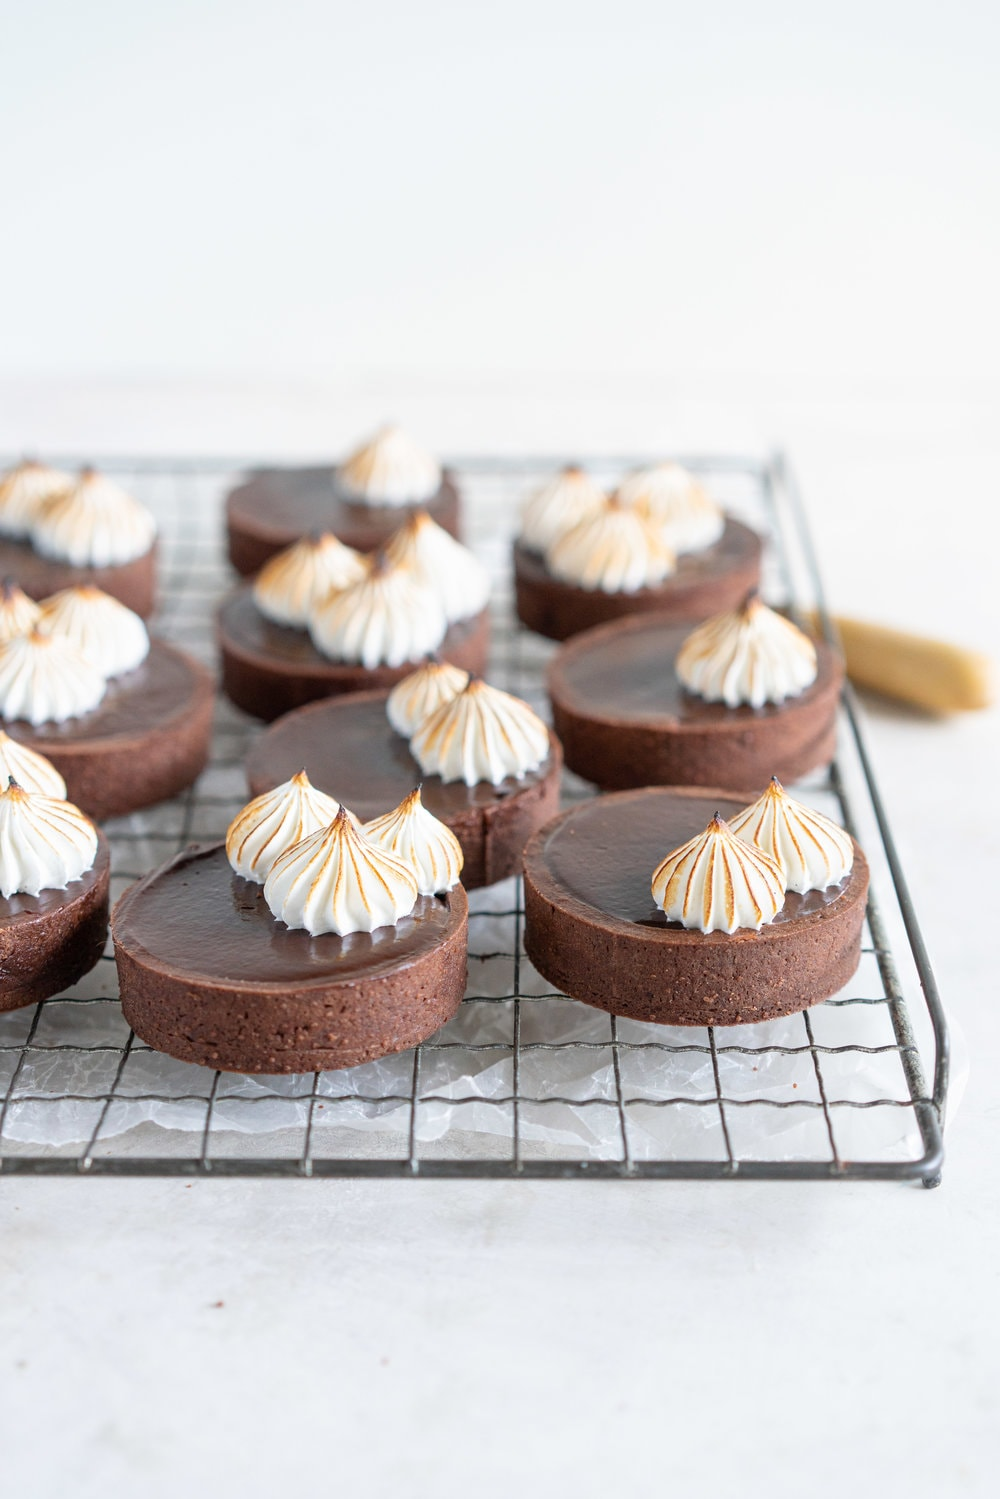 Dark Chocolate Peanut Butter Mini Tarts with Mixed Berry Jam, Chocolate Crust, and Torched Swiss Meringue #minitart #peanutbutterganache #chocolatetart